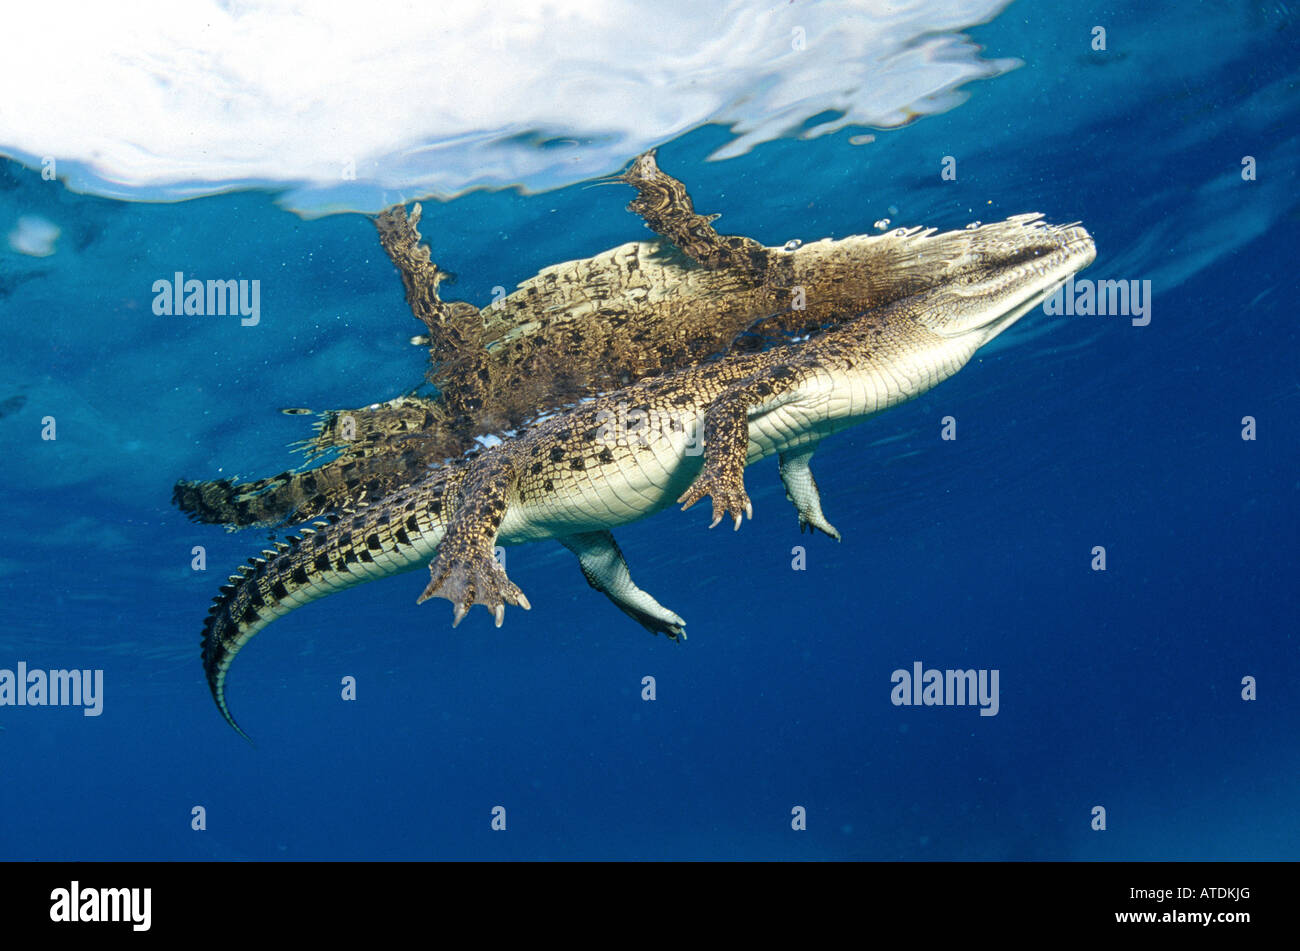 Saltwater Crocodile Crocodylus porosus Bismarc Sea Papua New Guinea - Stock Image